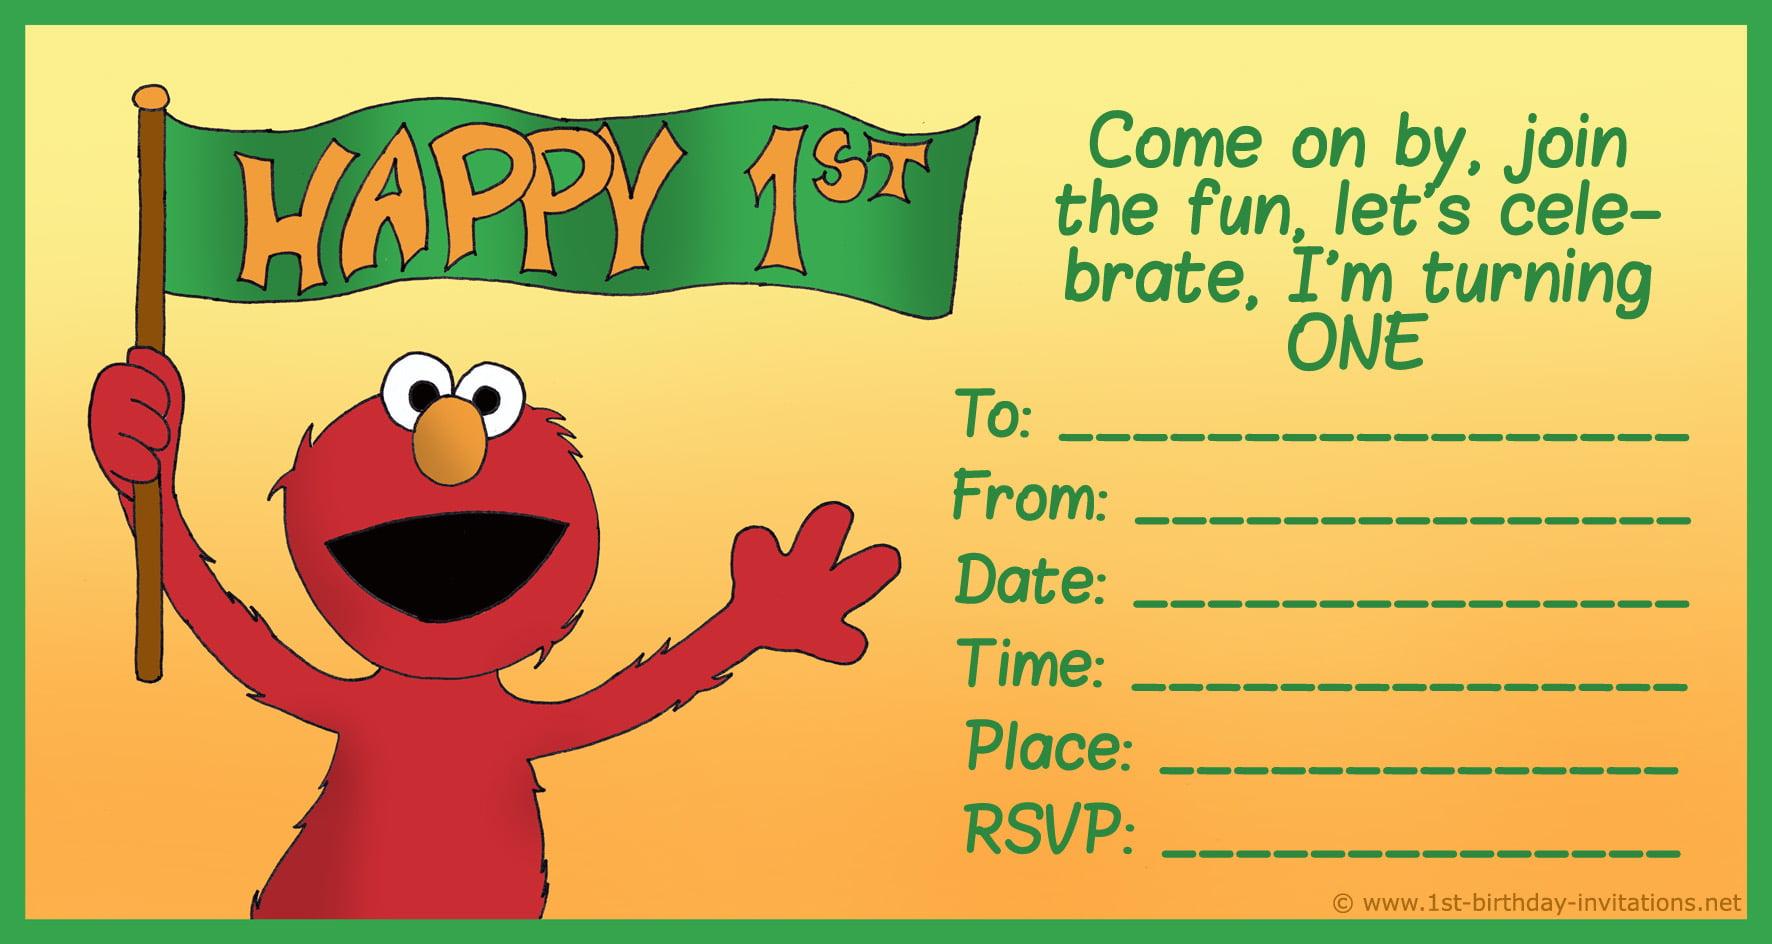 Happy Birthday Invitation Card Online